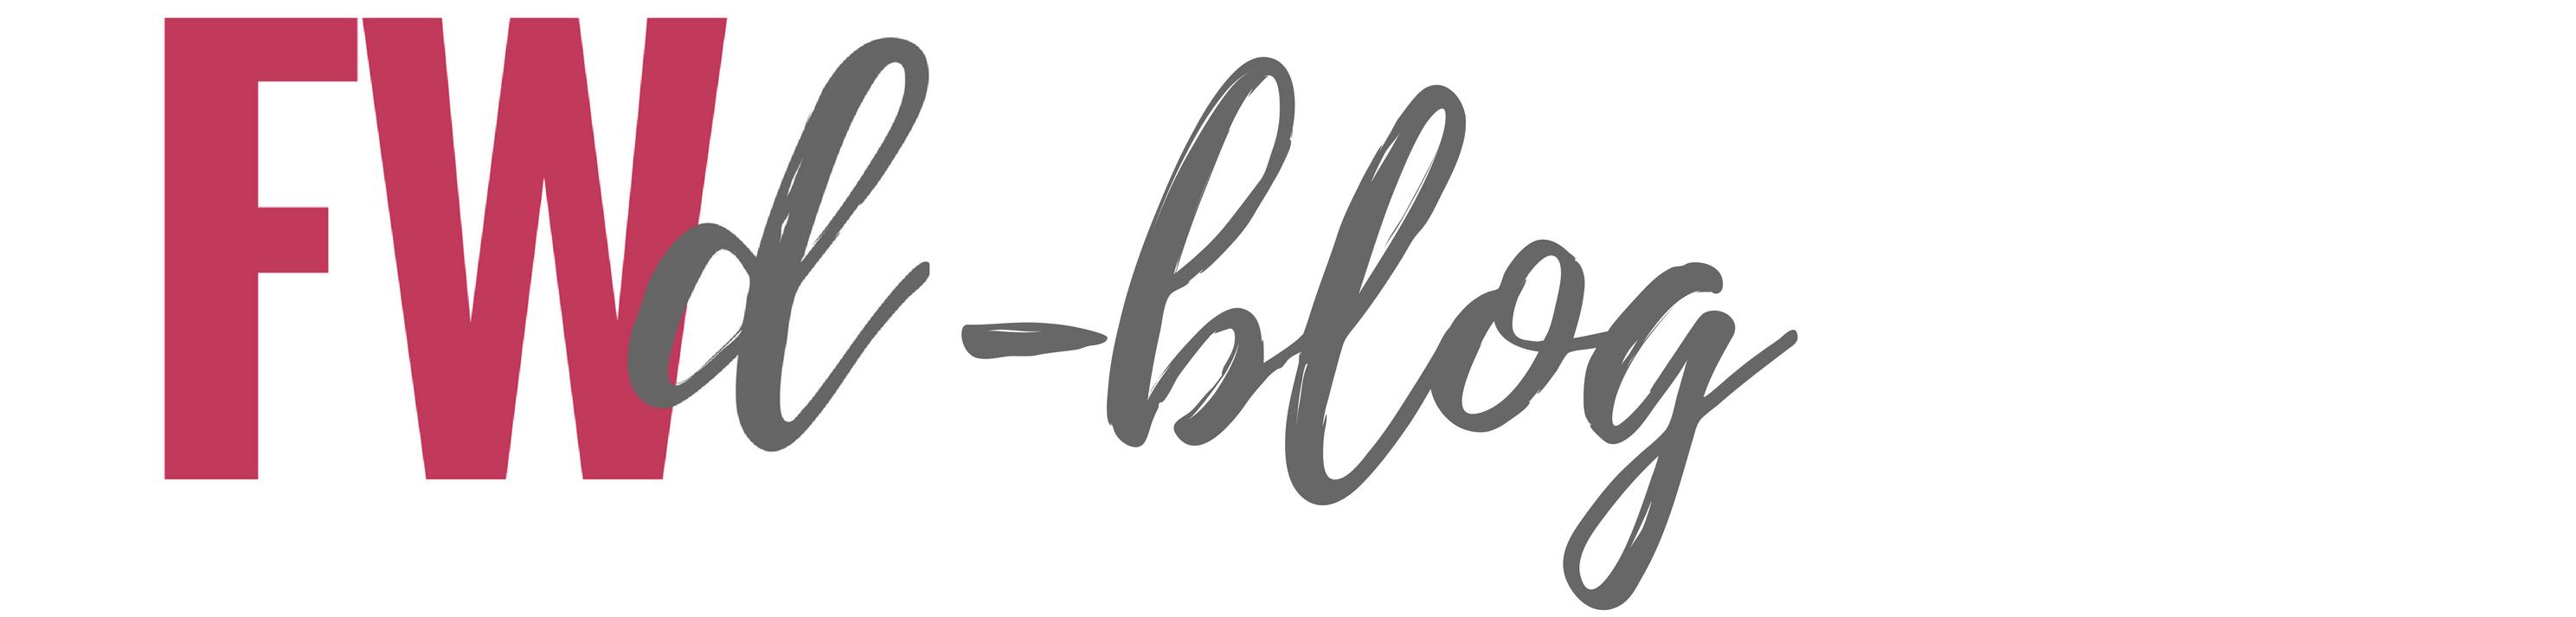 Freight forwarder Directory Blog